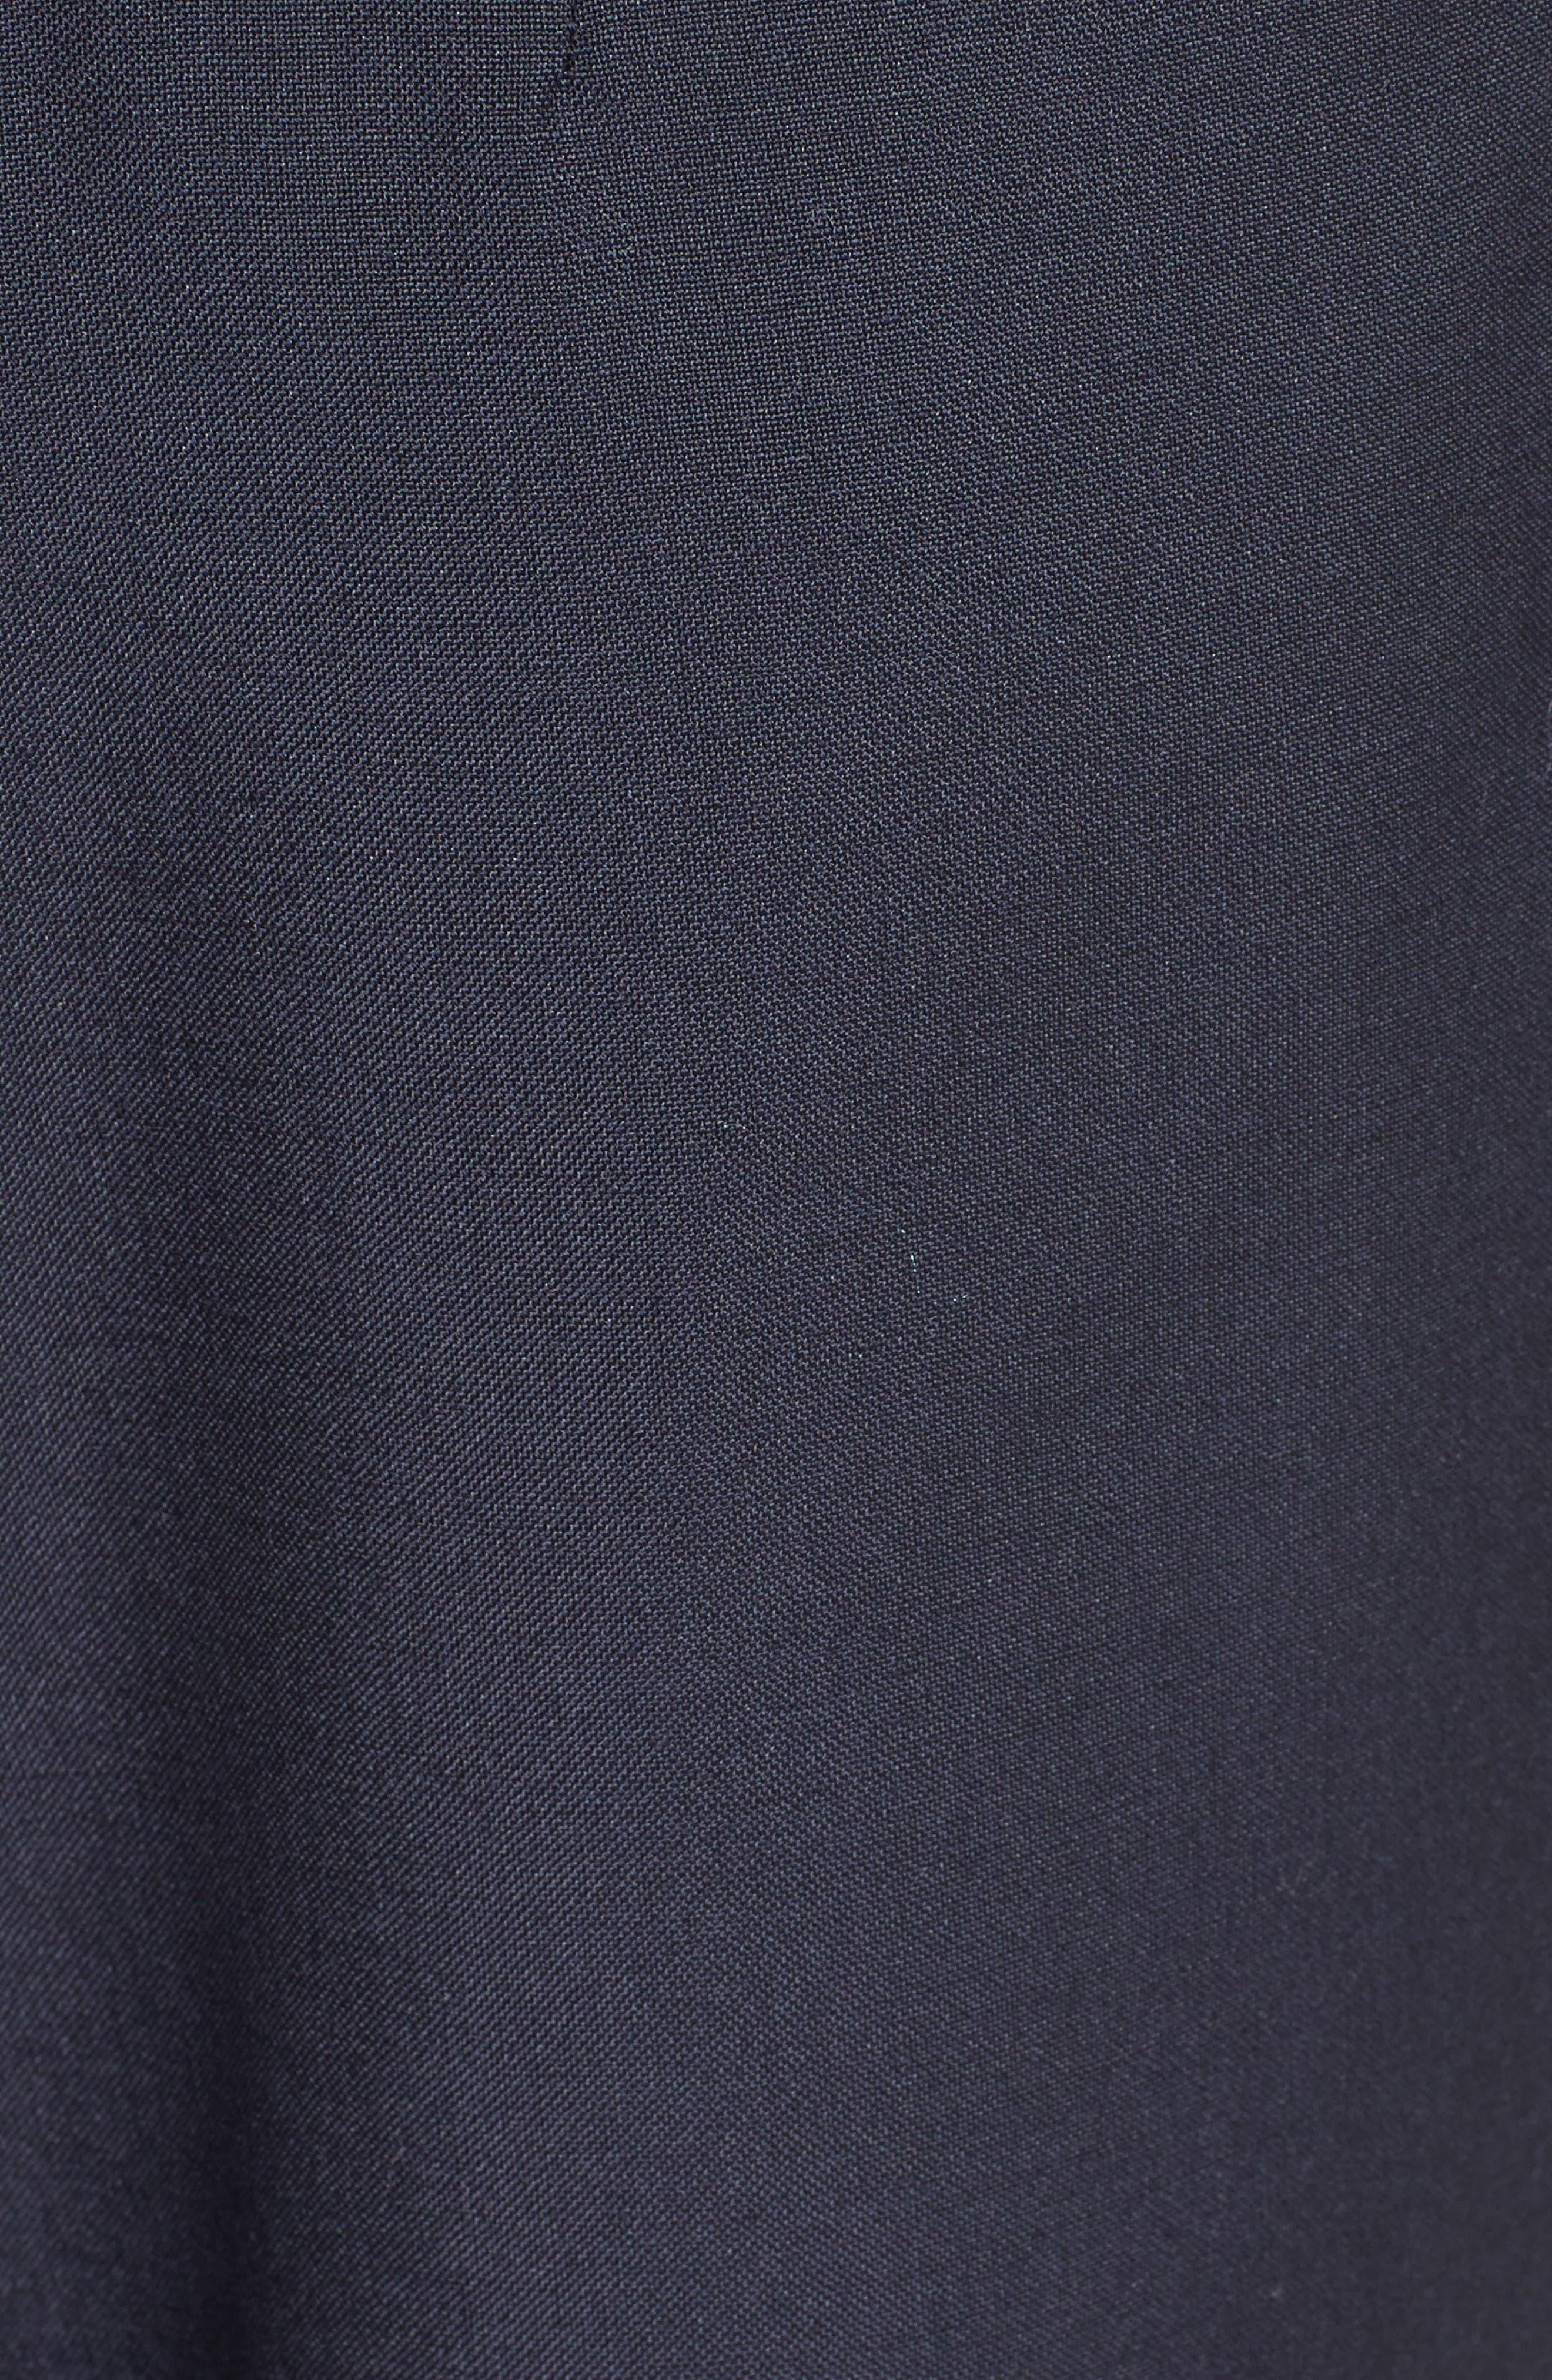 Tropical Wool & Kid Mohair Crop Pants,                             Alternate thumbnail 3, color,                             Navy